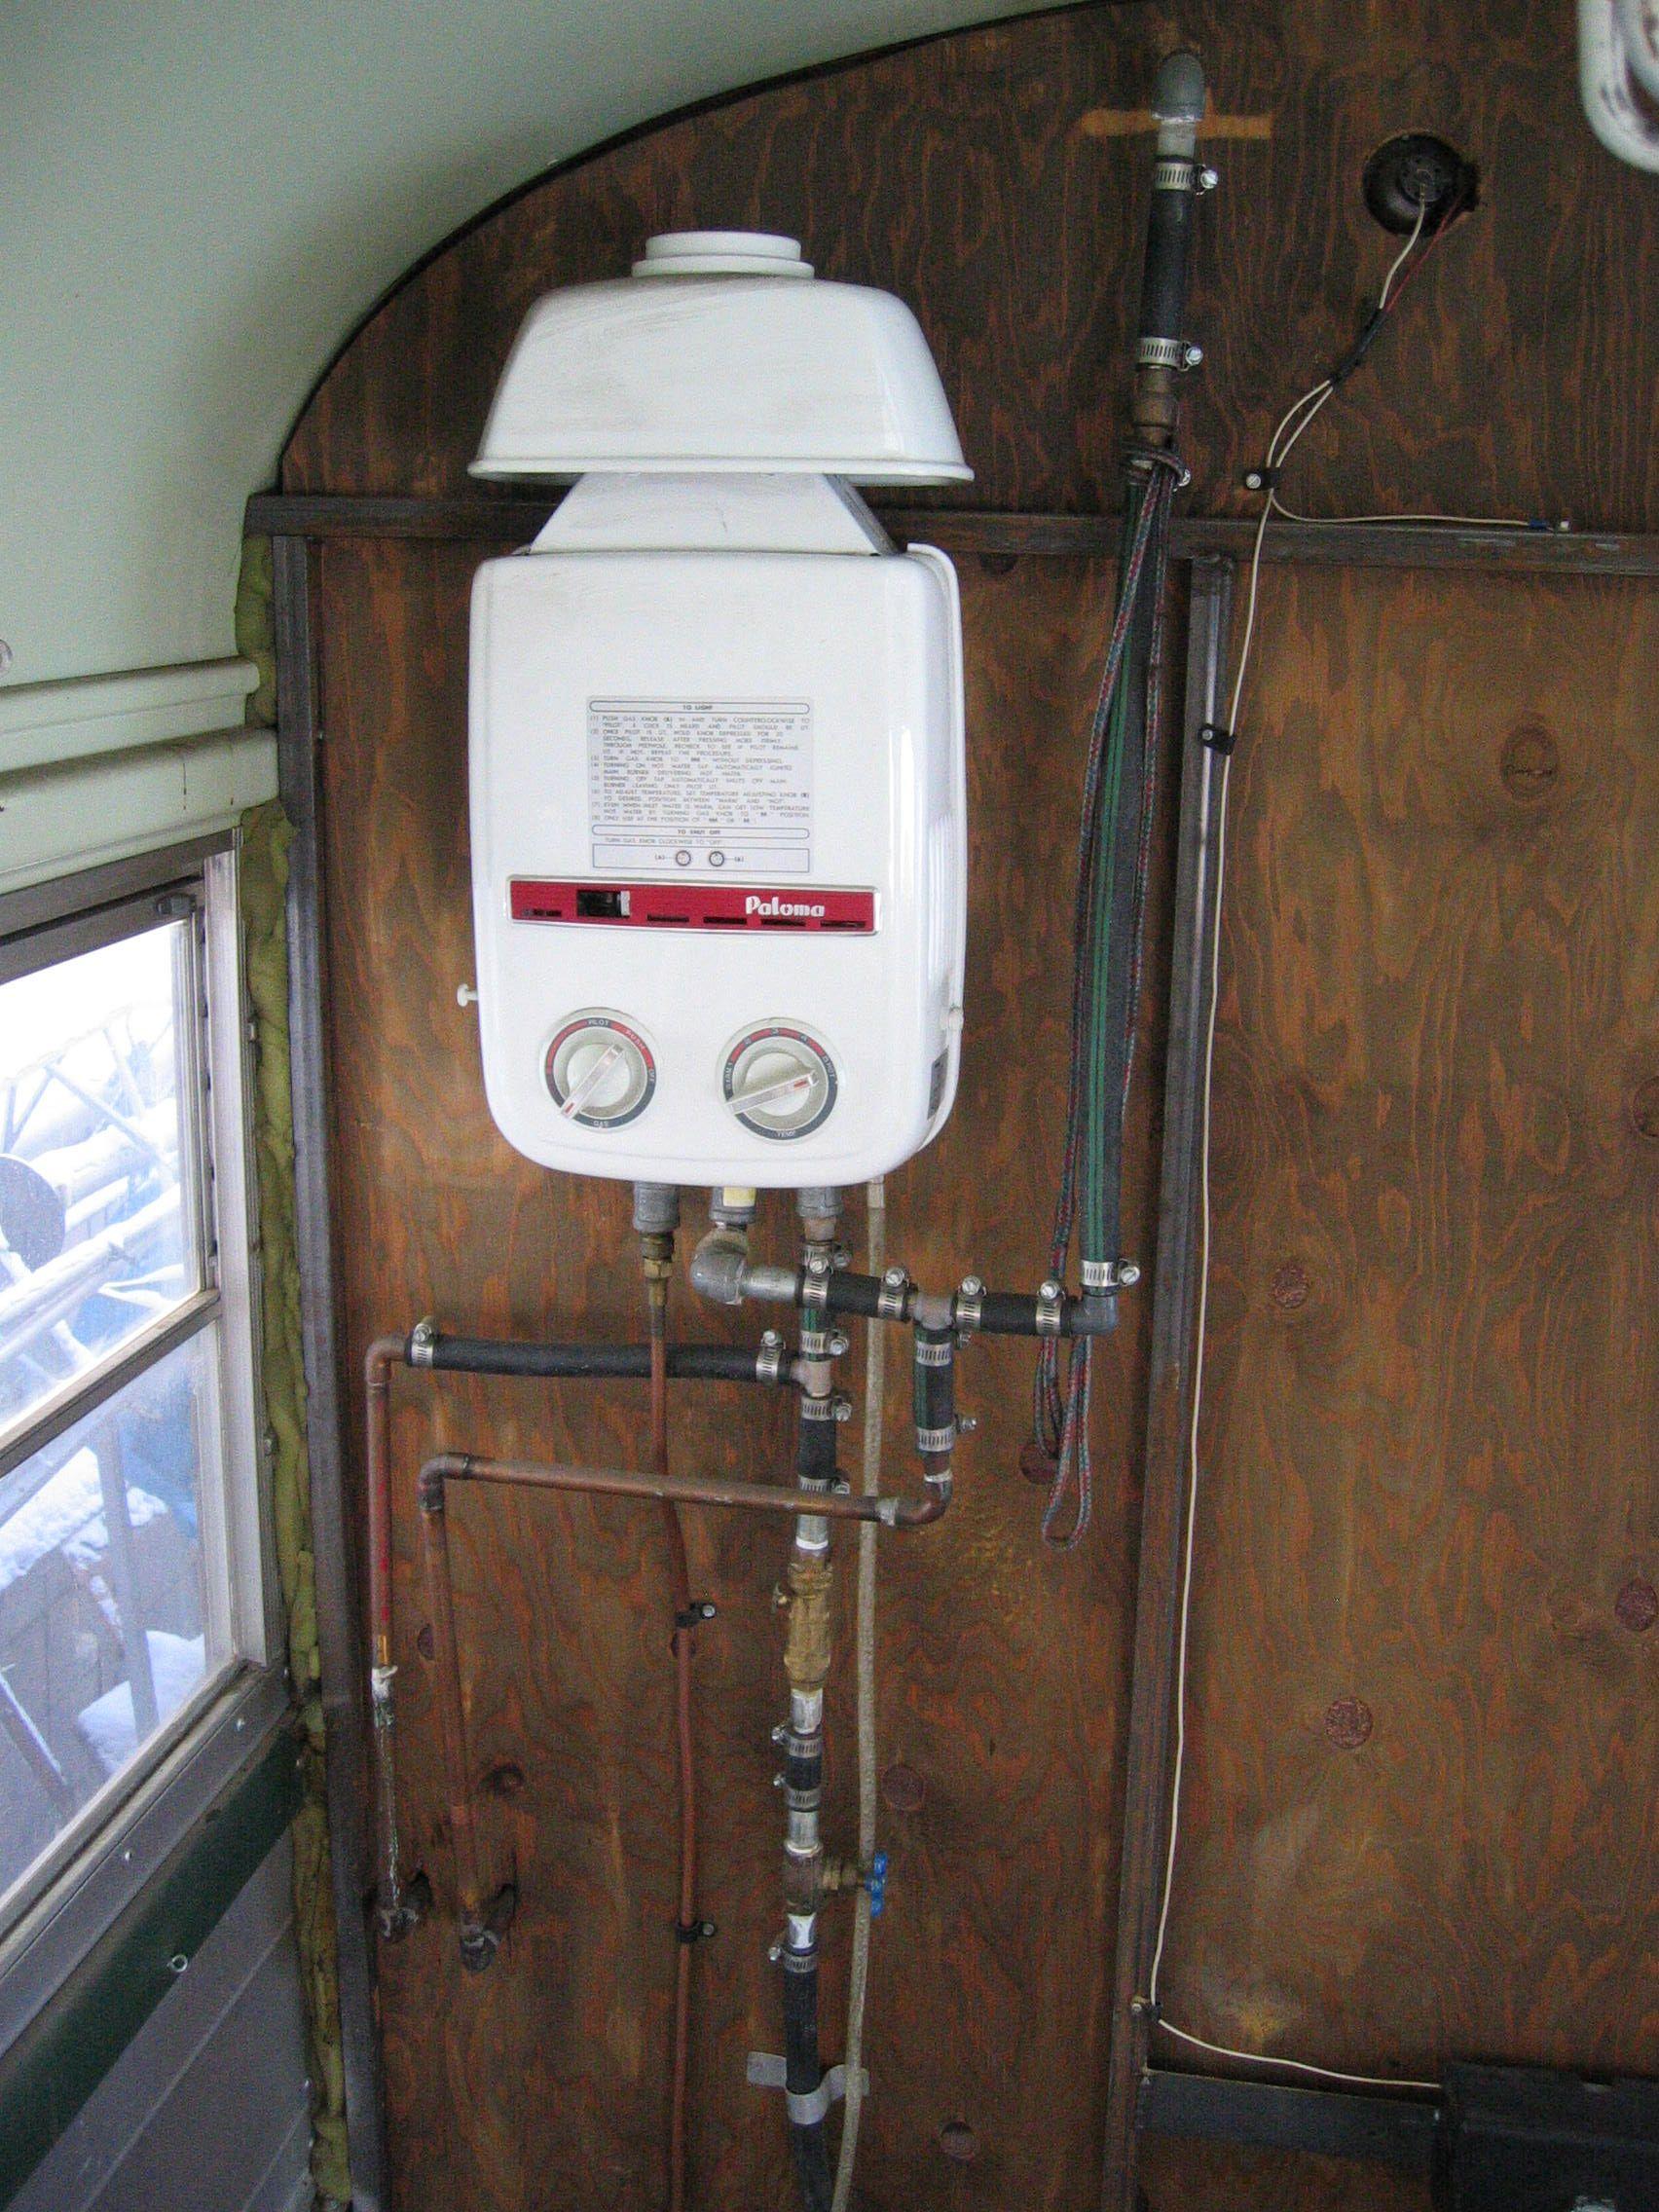 On Demand Water Heater キャンピングカー キャンピングカー、アウトドア、生活